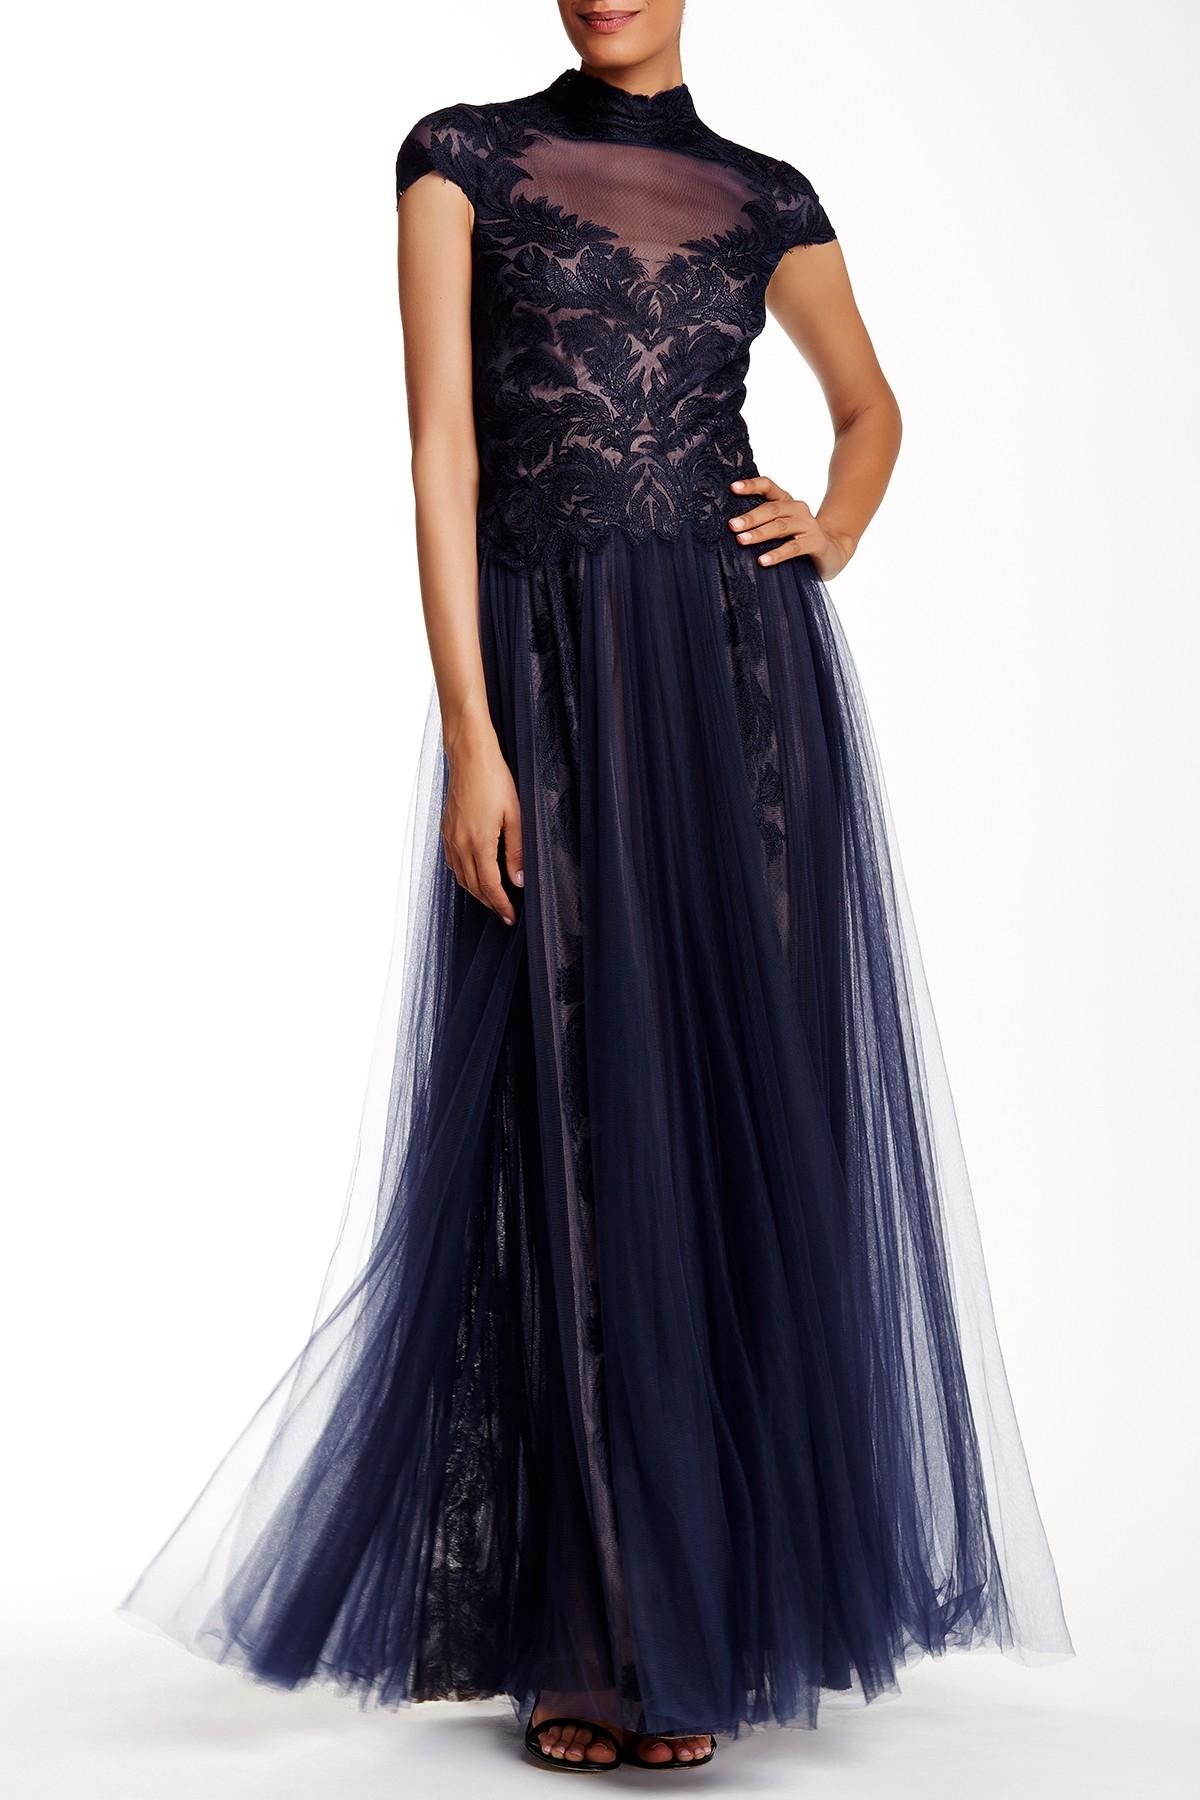 Nordstrom Prom Dresses Plus Size